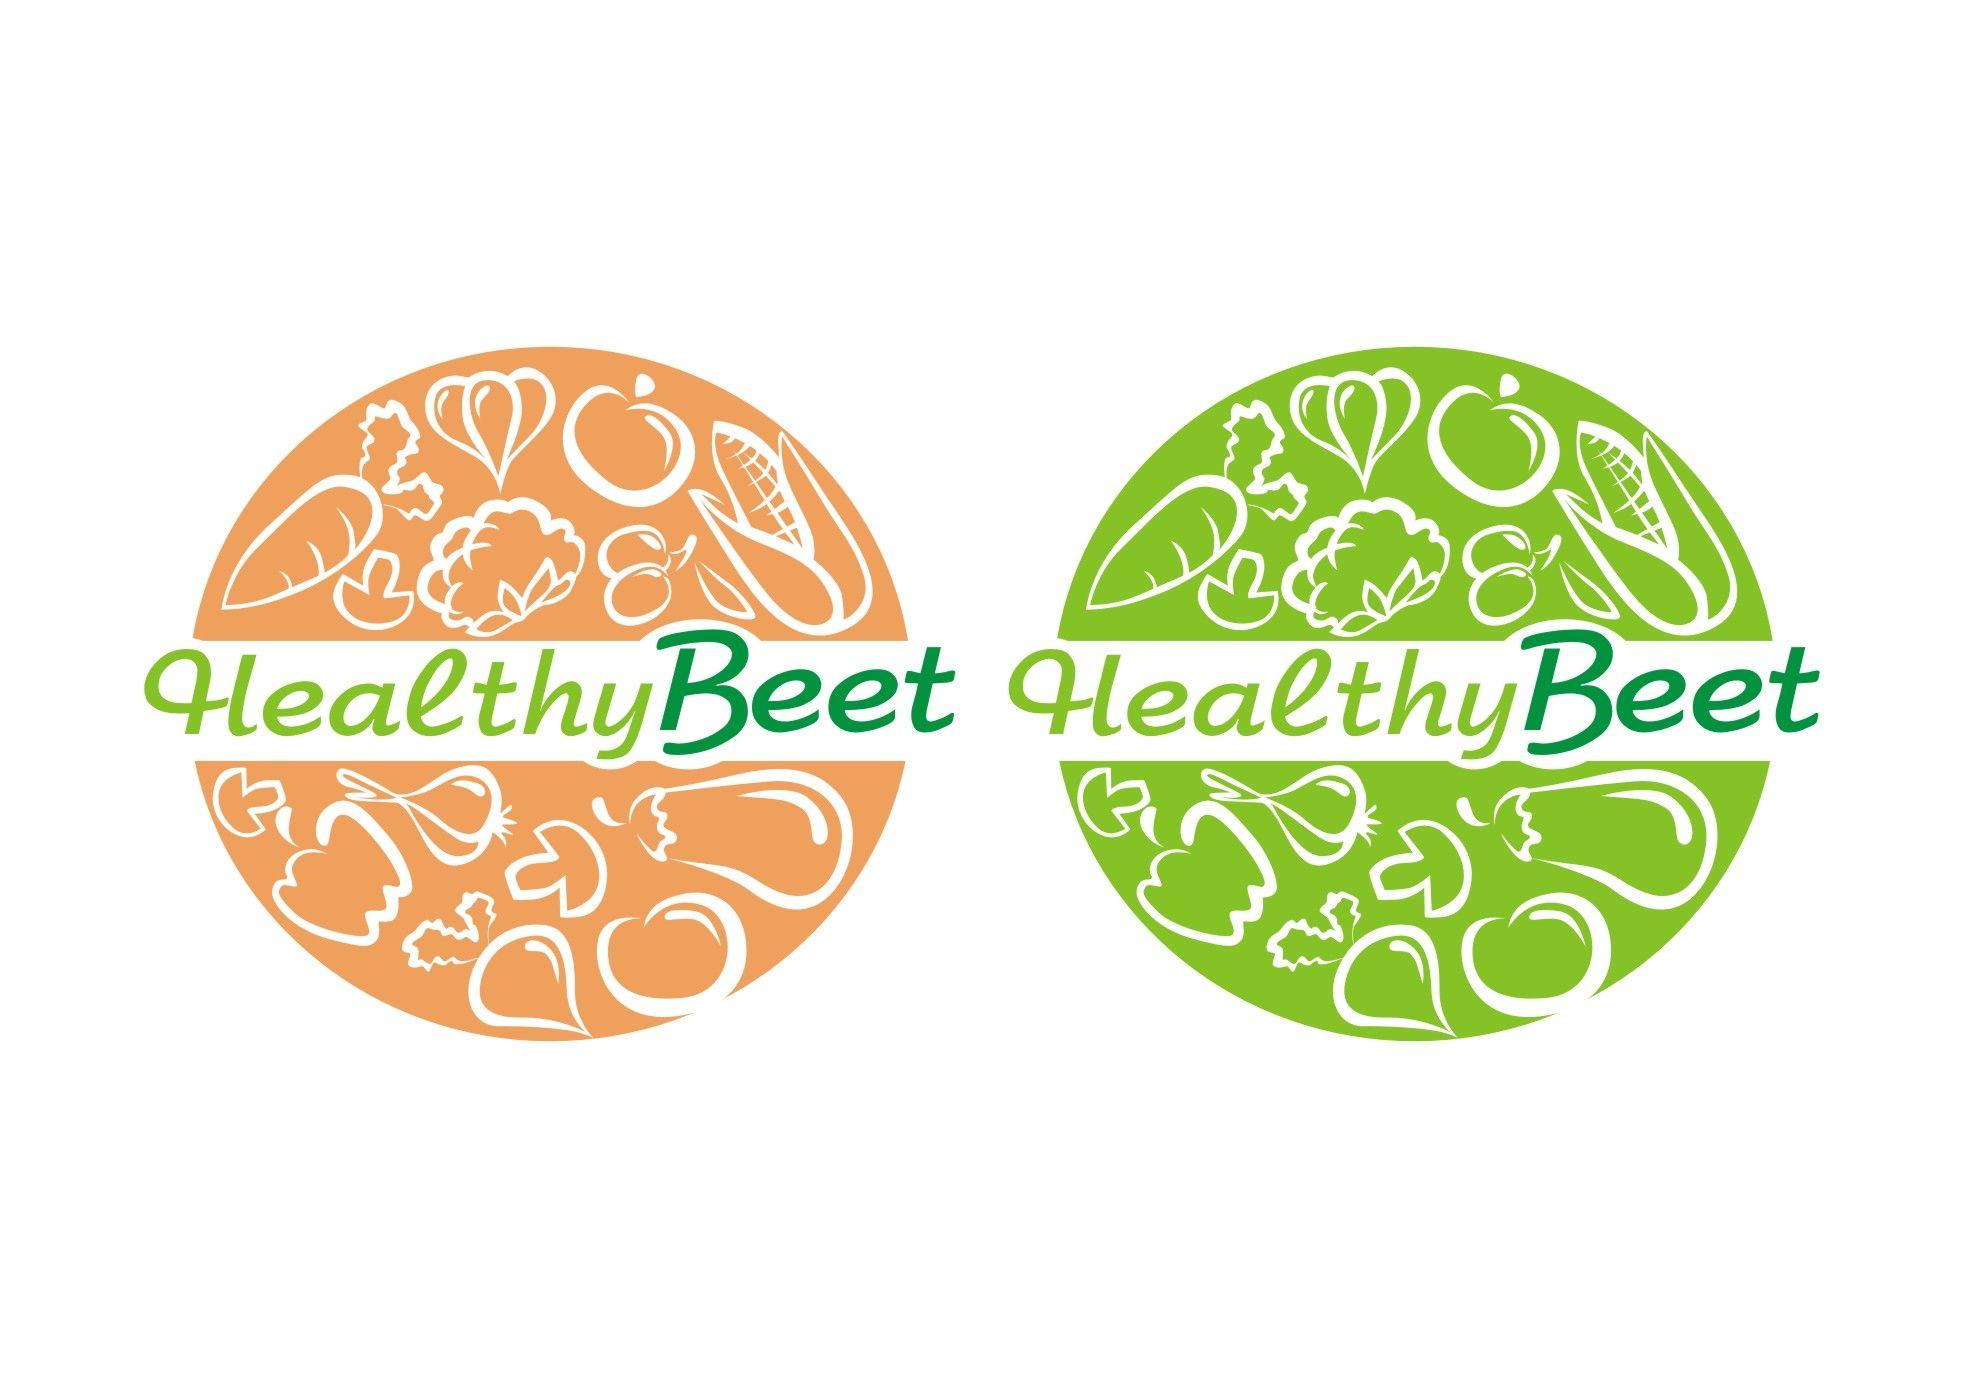 Healthy Bit или Healthy Beet - дизайнер Shekret